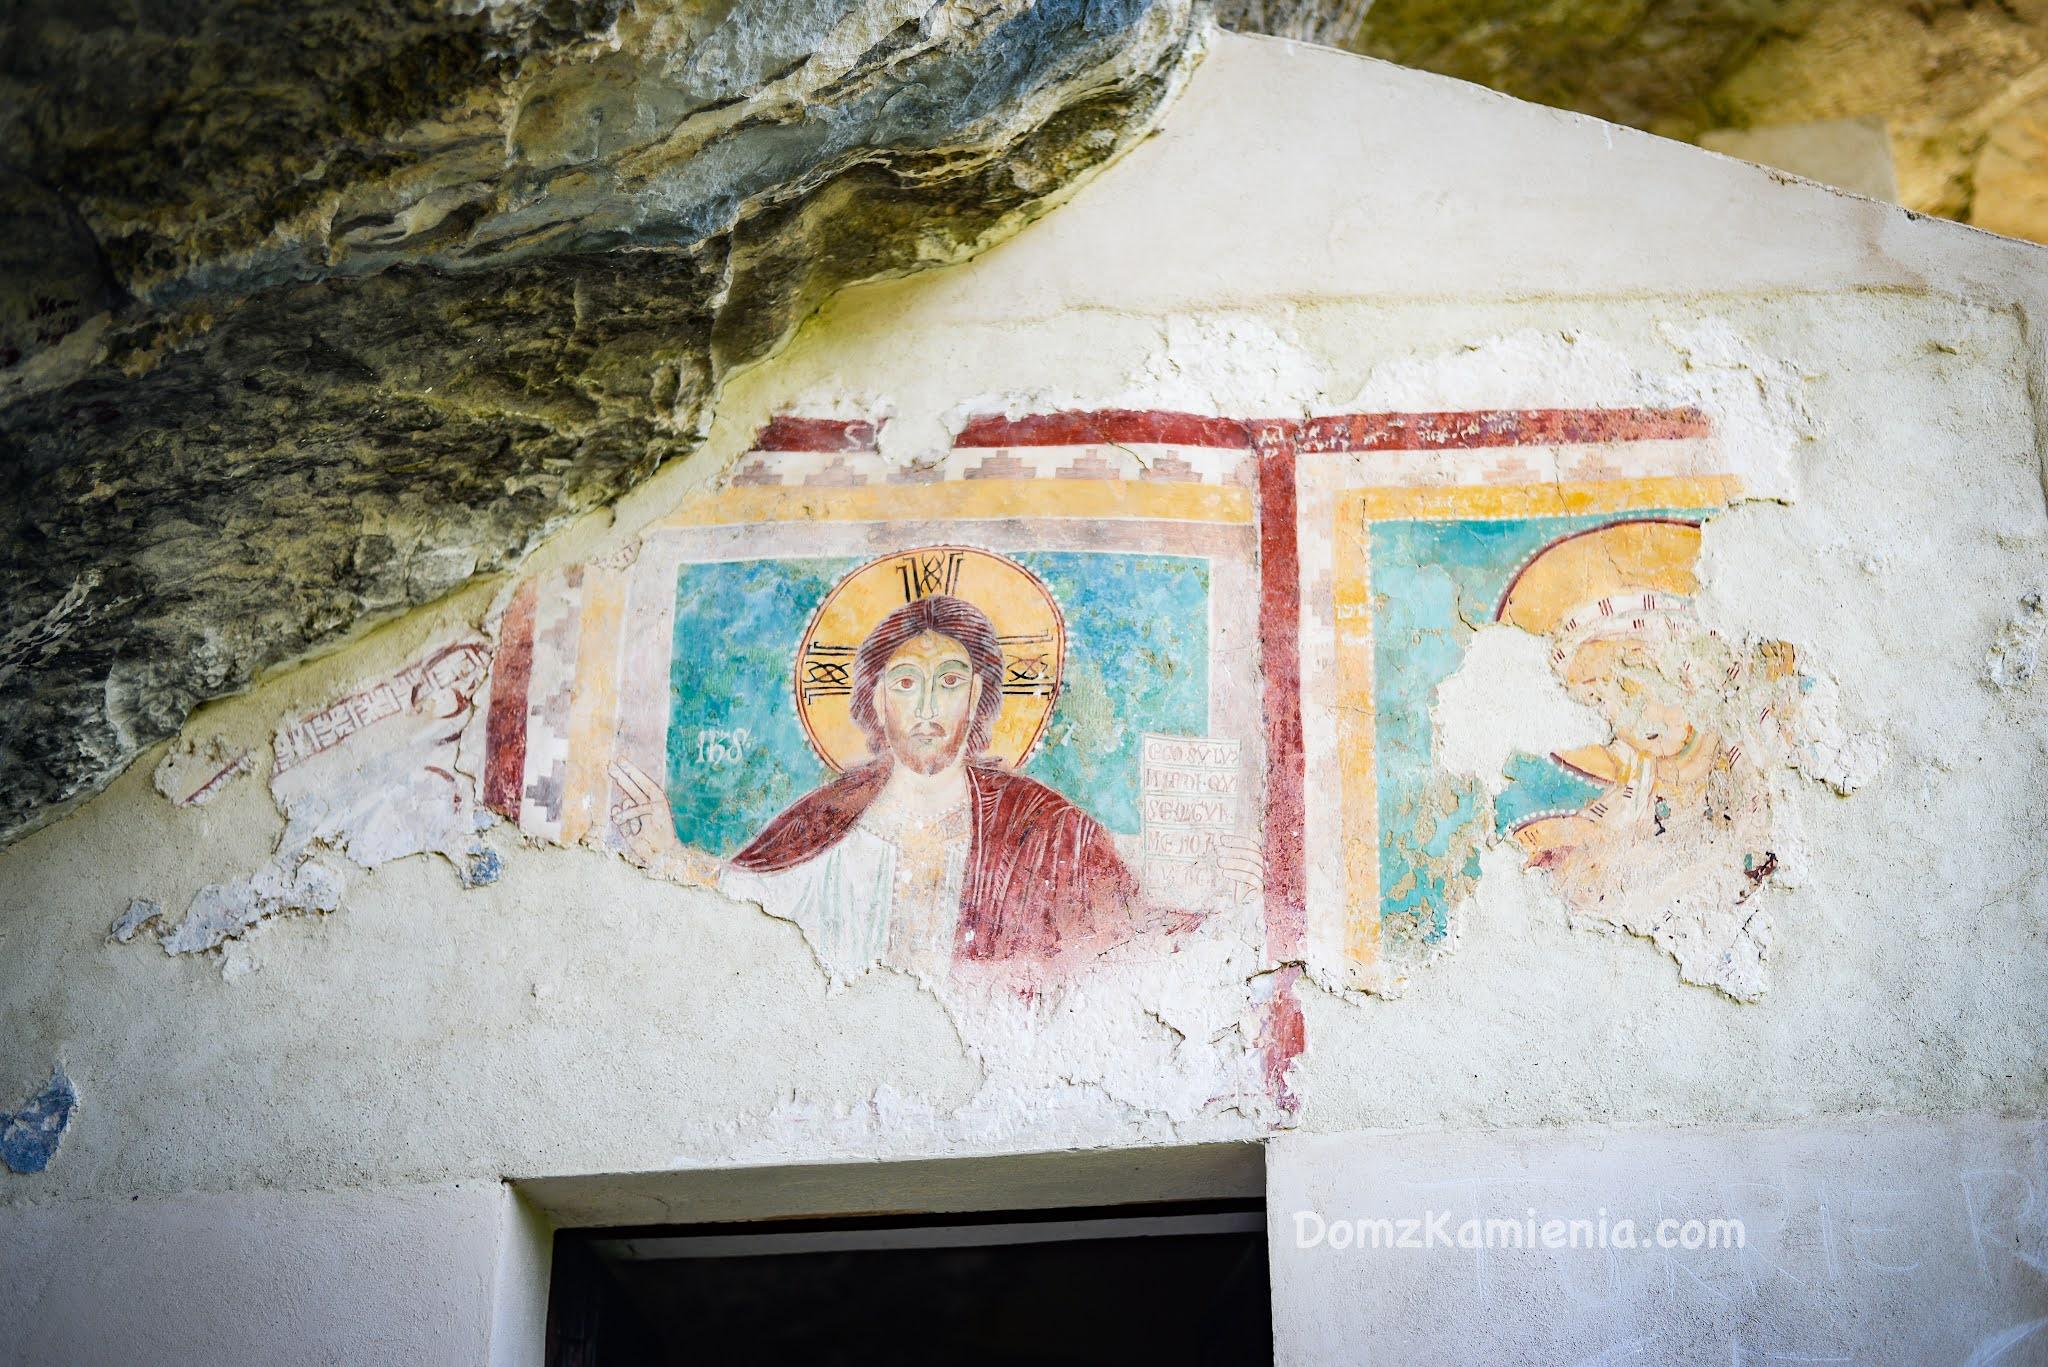 San Bartolomeo eremo - Abruzzo, Dom z Kamienia blog